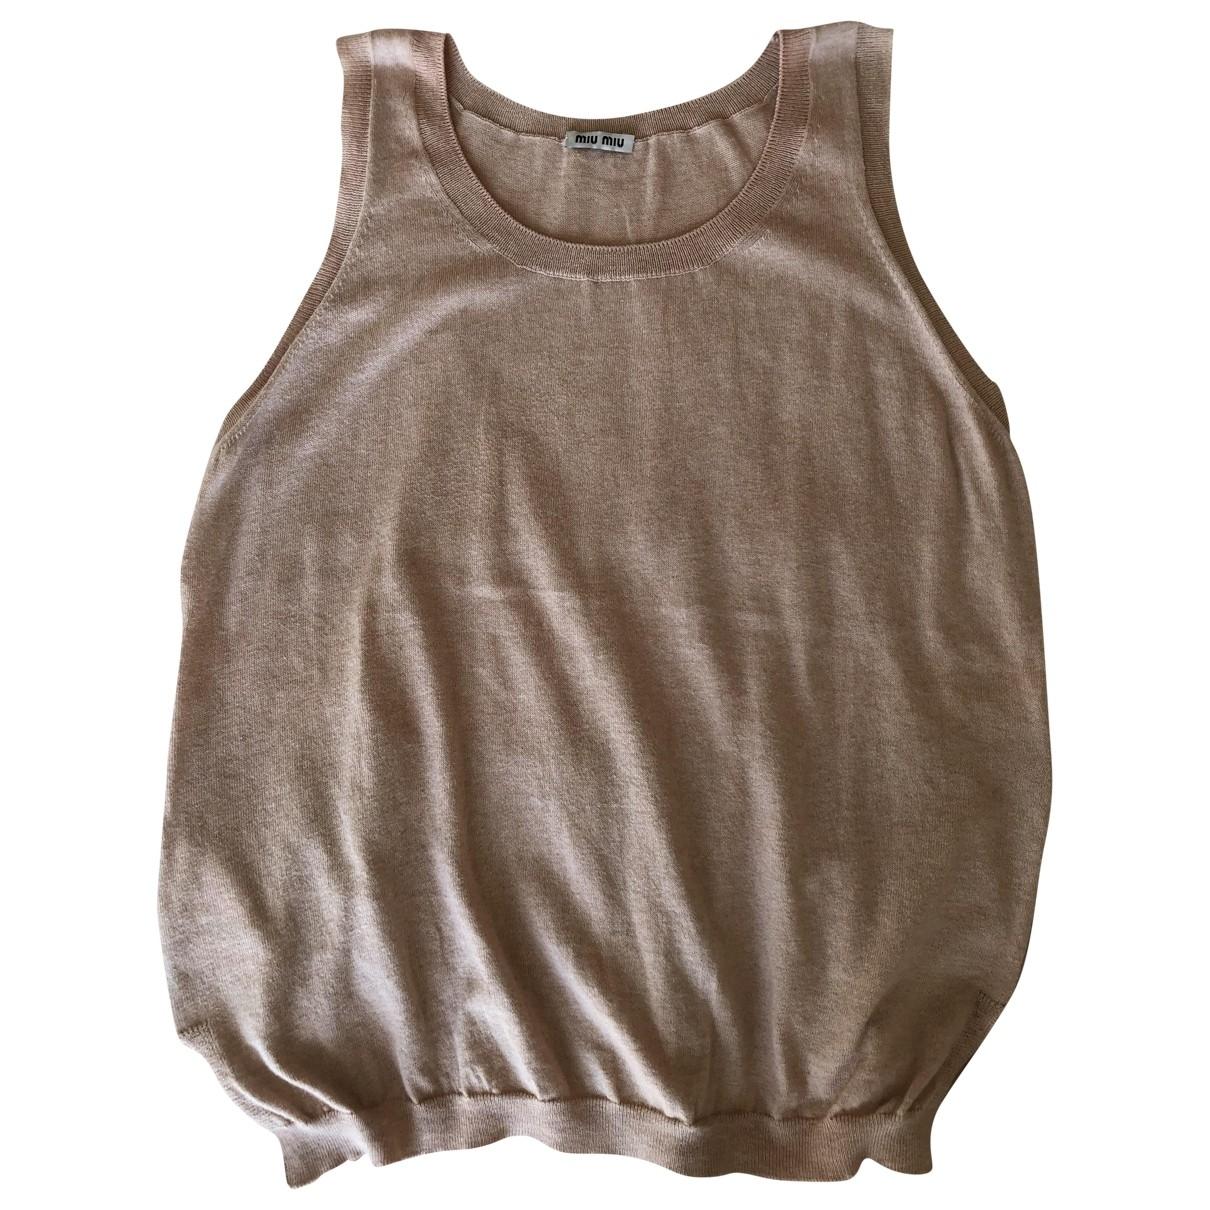 Camiseta sin mangas Miu Miu